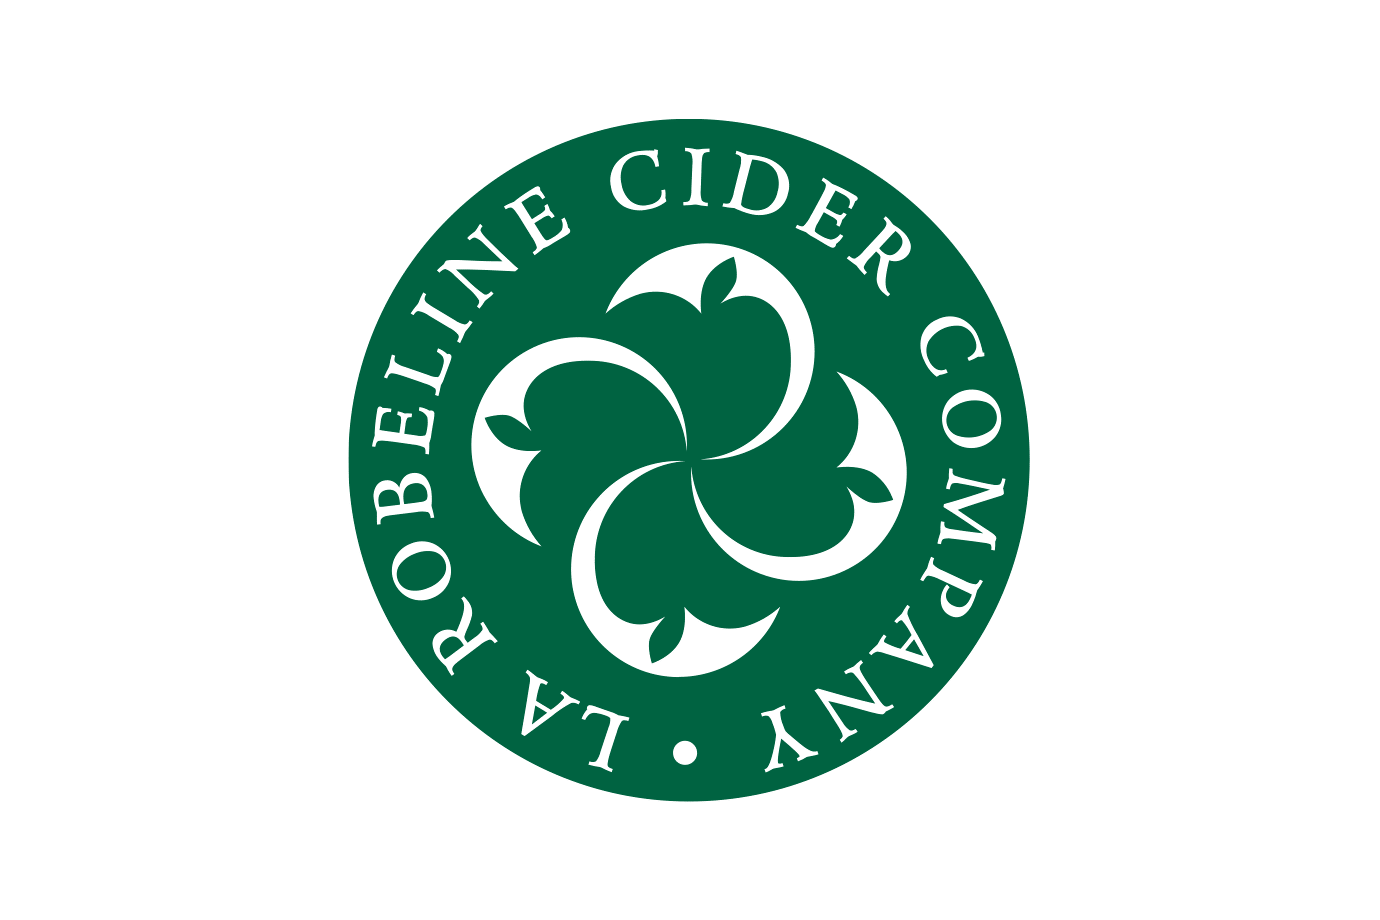 La Robeline Cider Company Ltd and La Robeline Cuisine